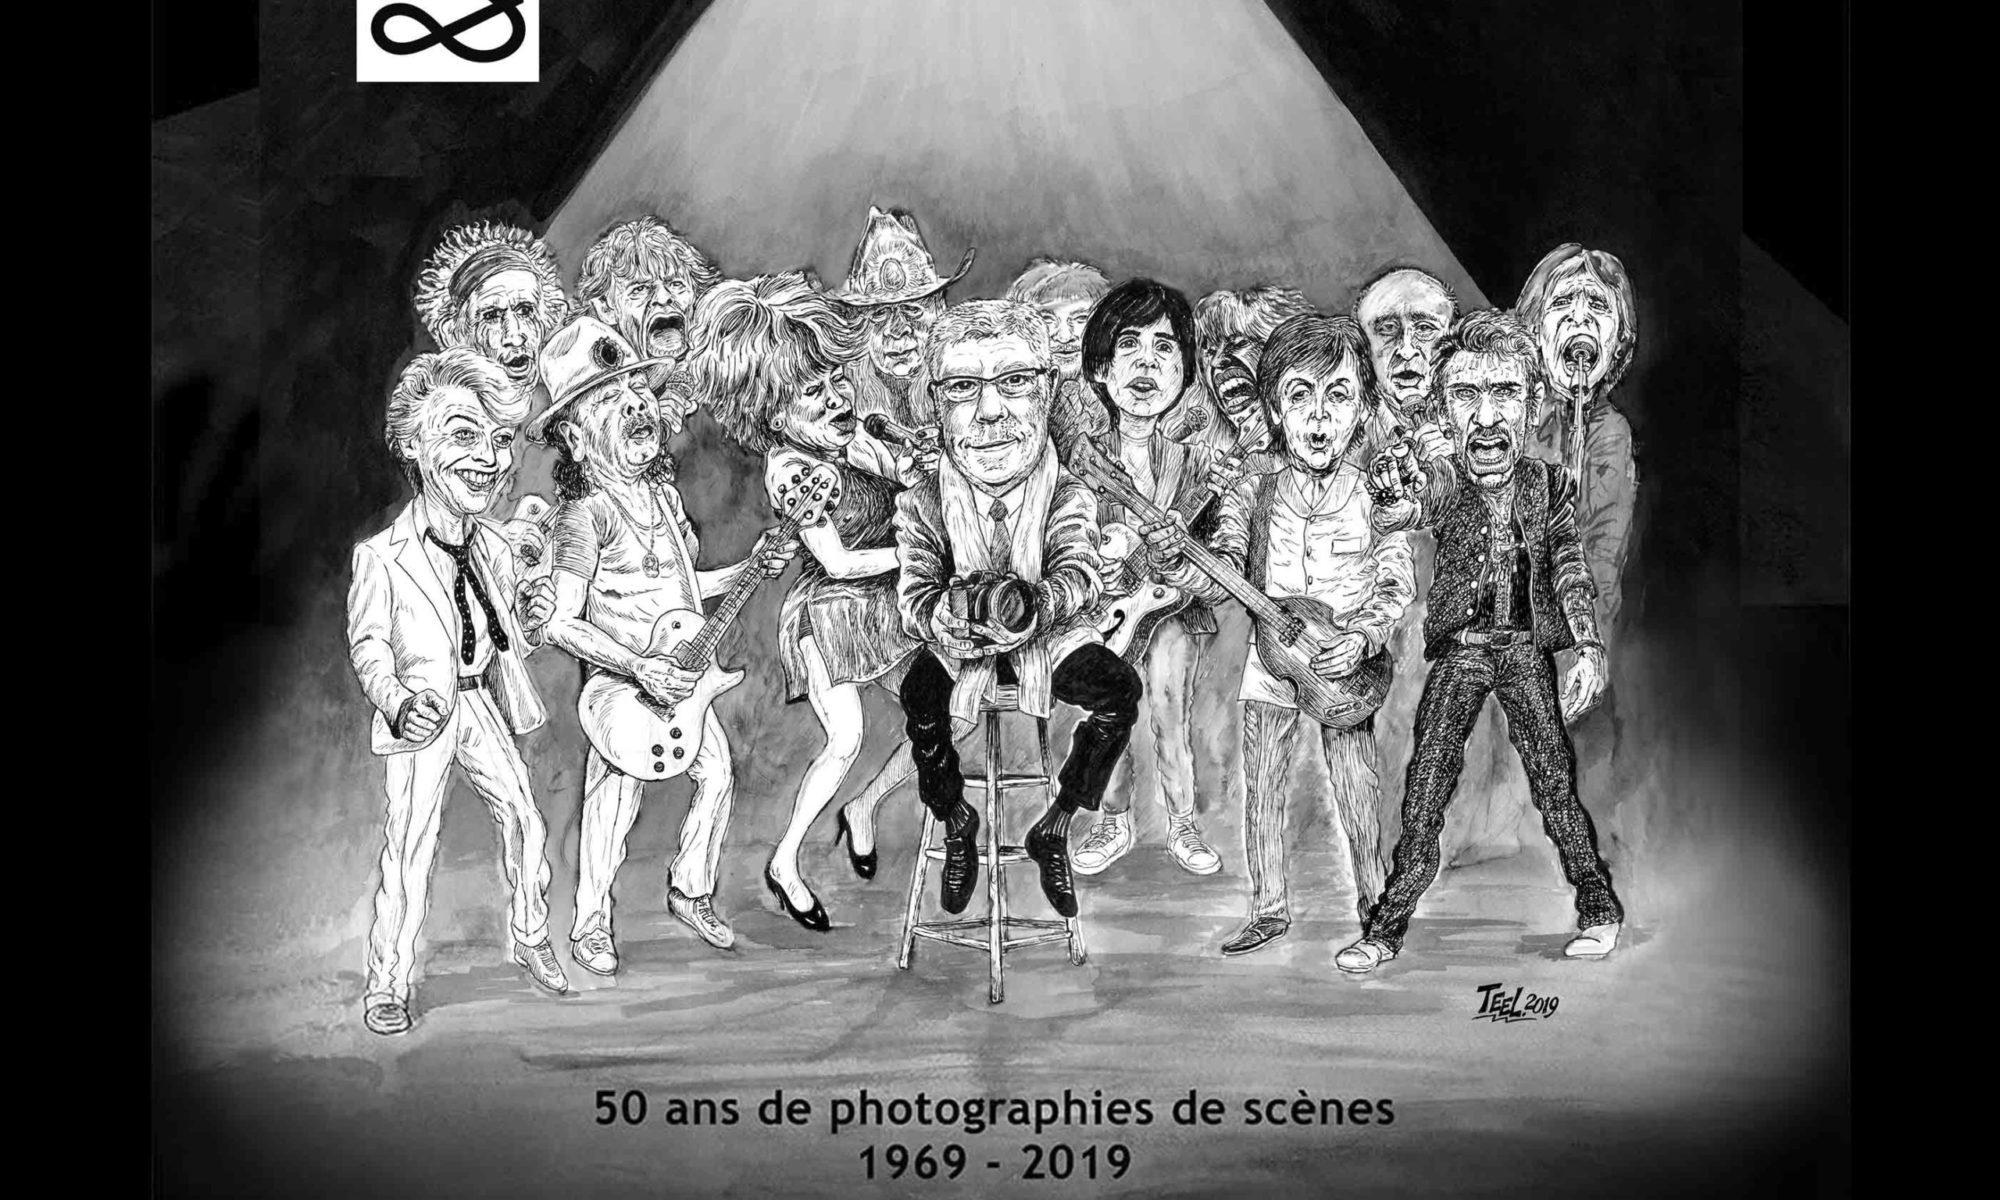 Musique & Rencontres 1969 - 2019